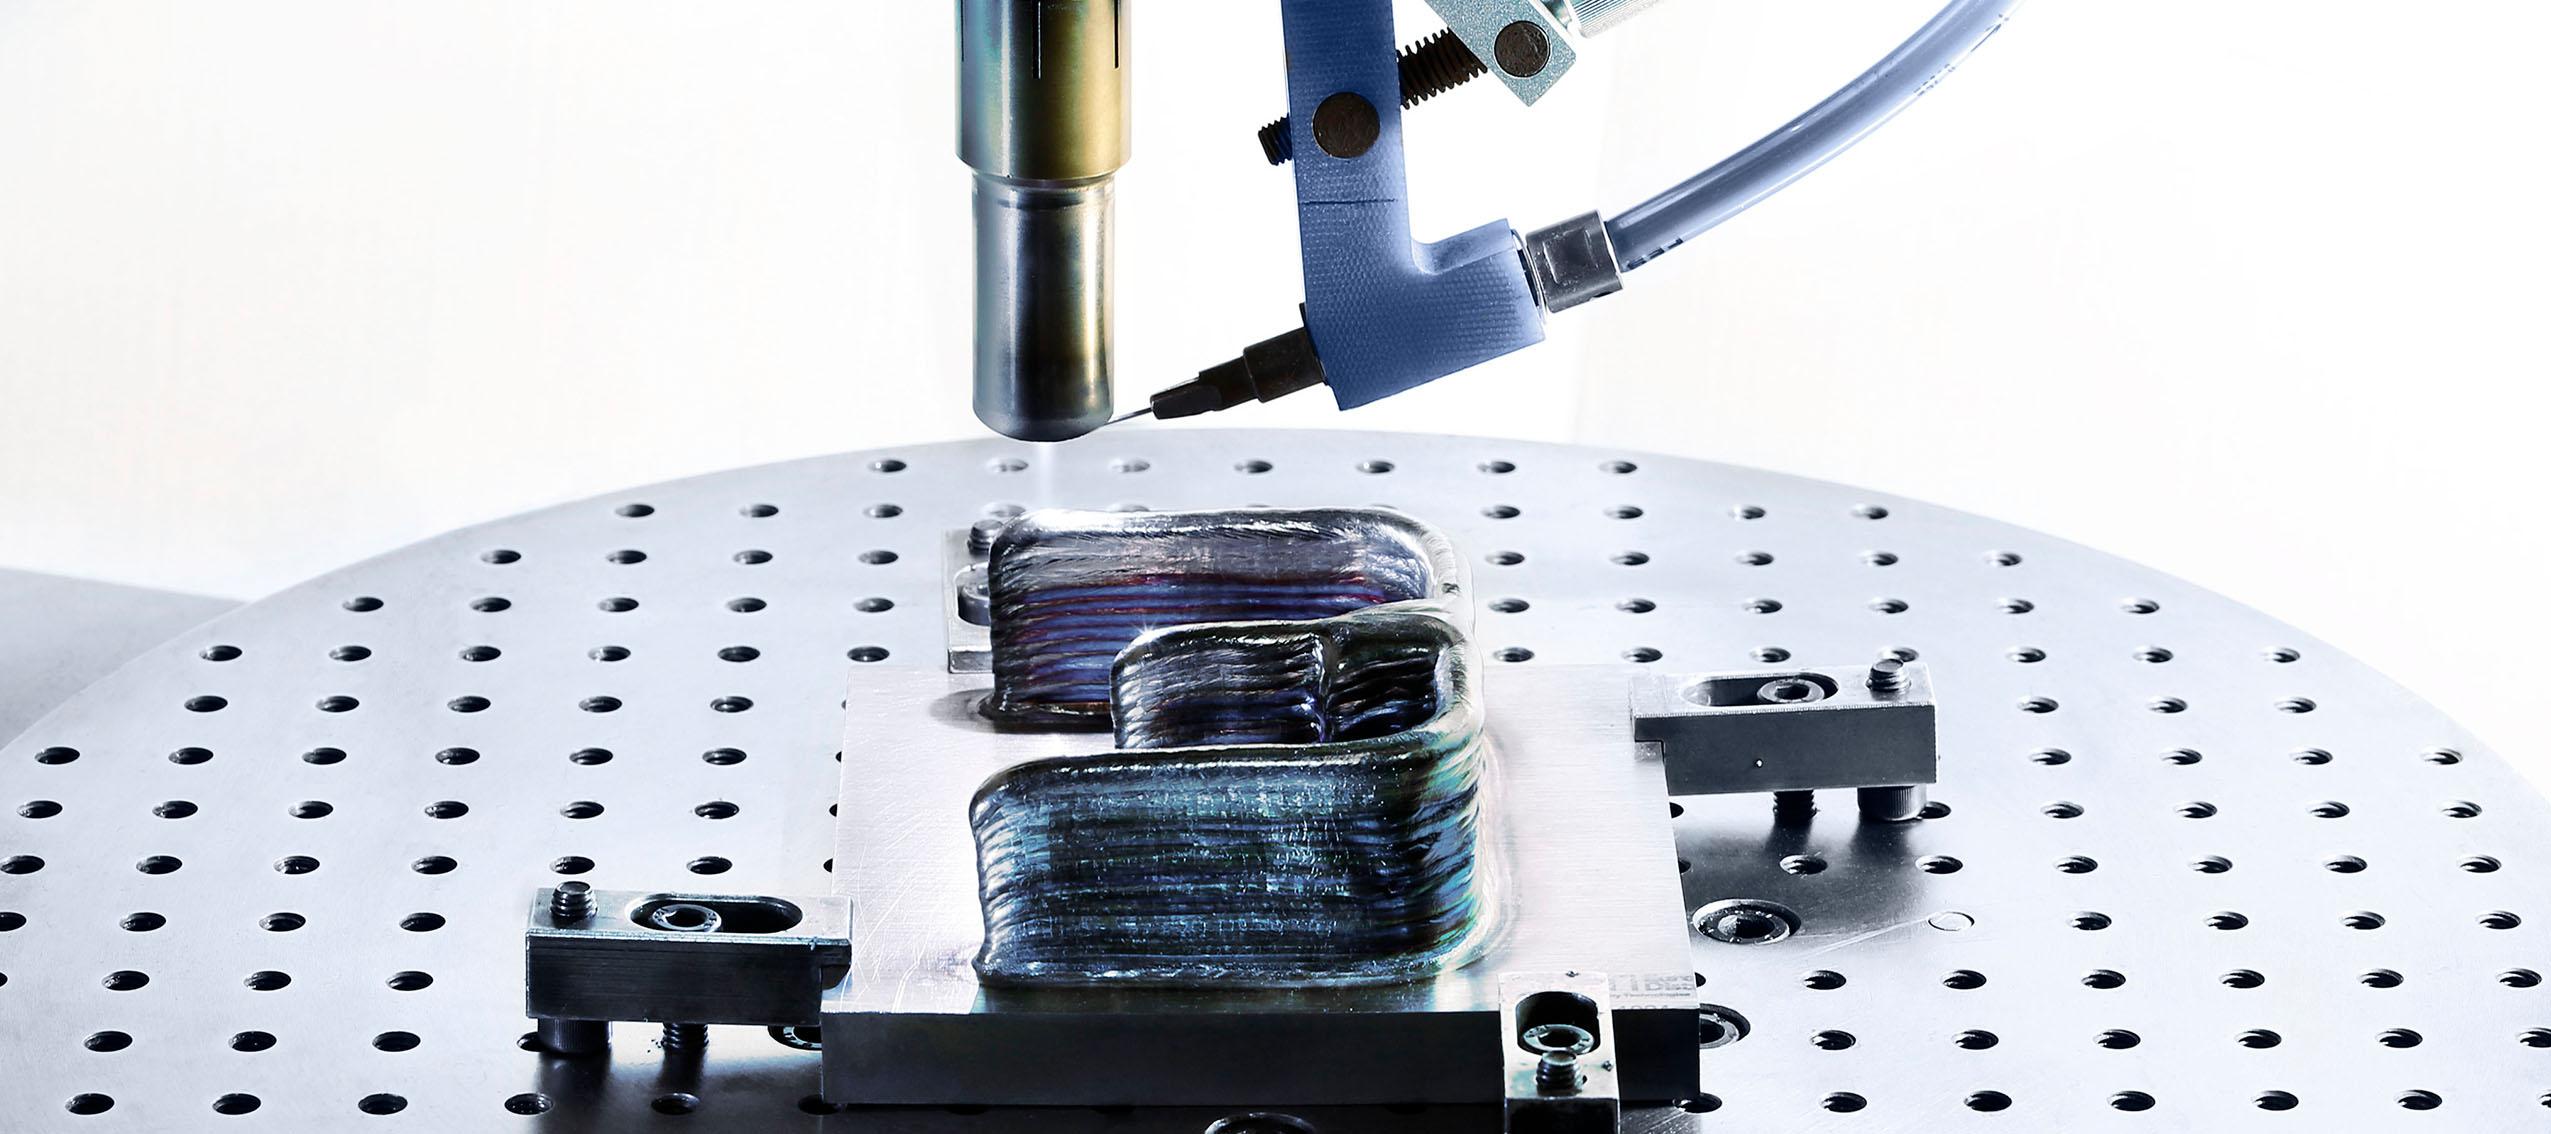 Maherholding Group and ONA Electroerosion collaborate to create ADDILAN